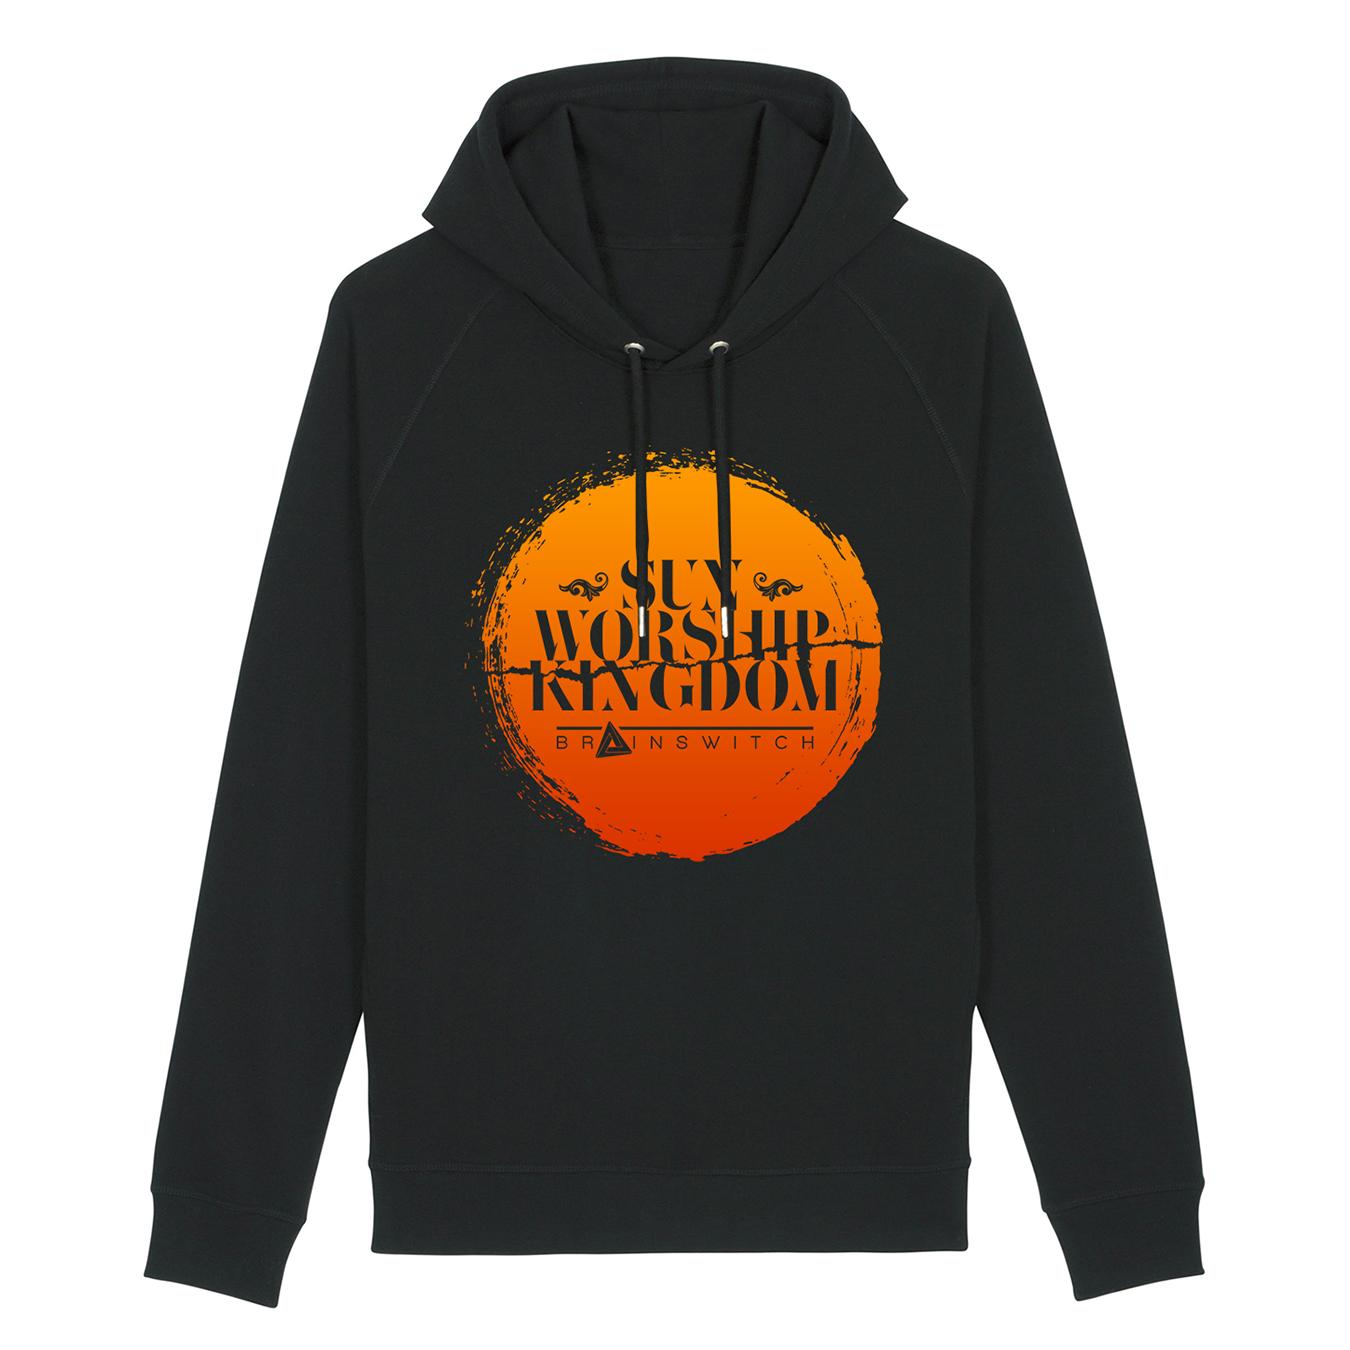 BRAINSWITCH - Sun Worship Kingdom - Hoodie